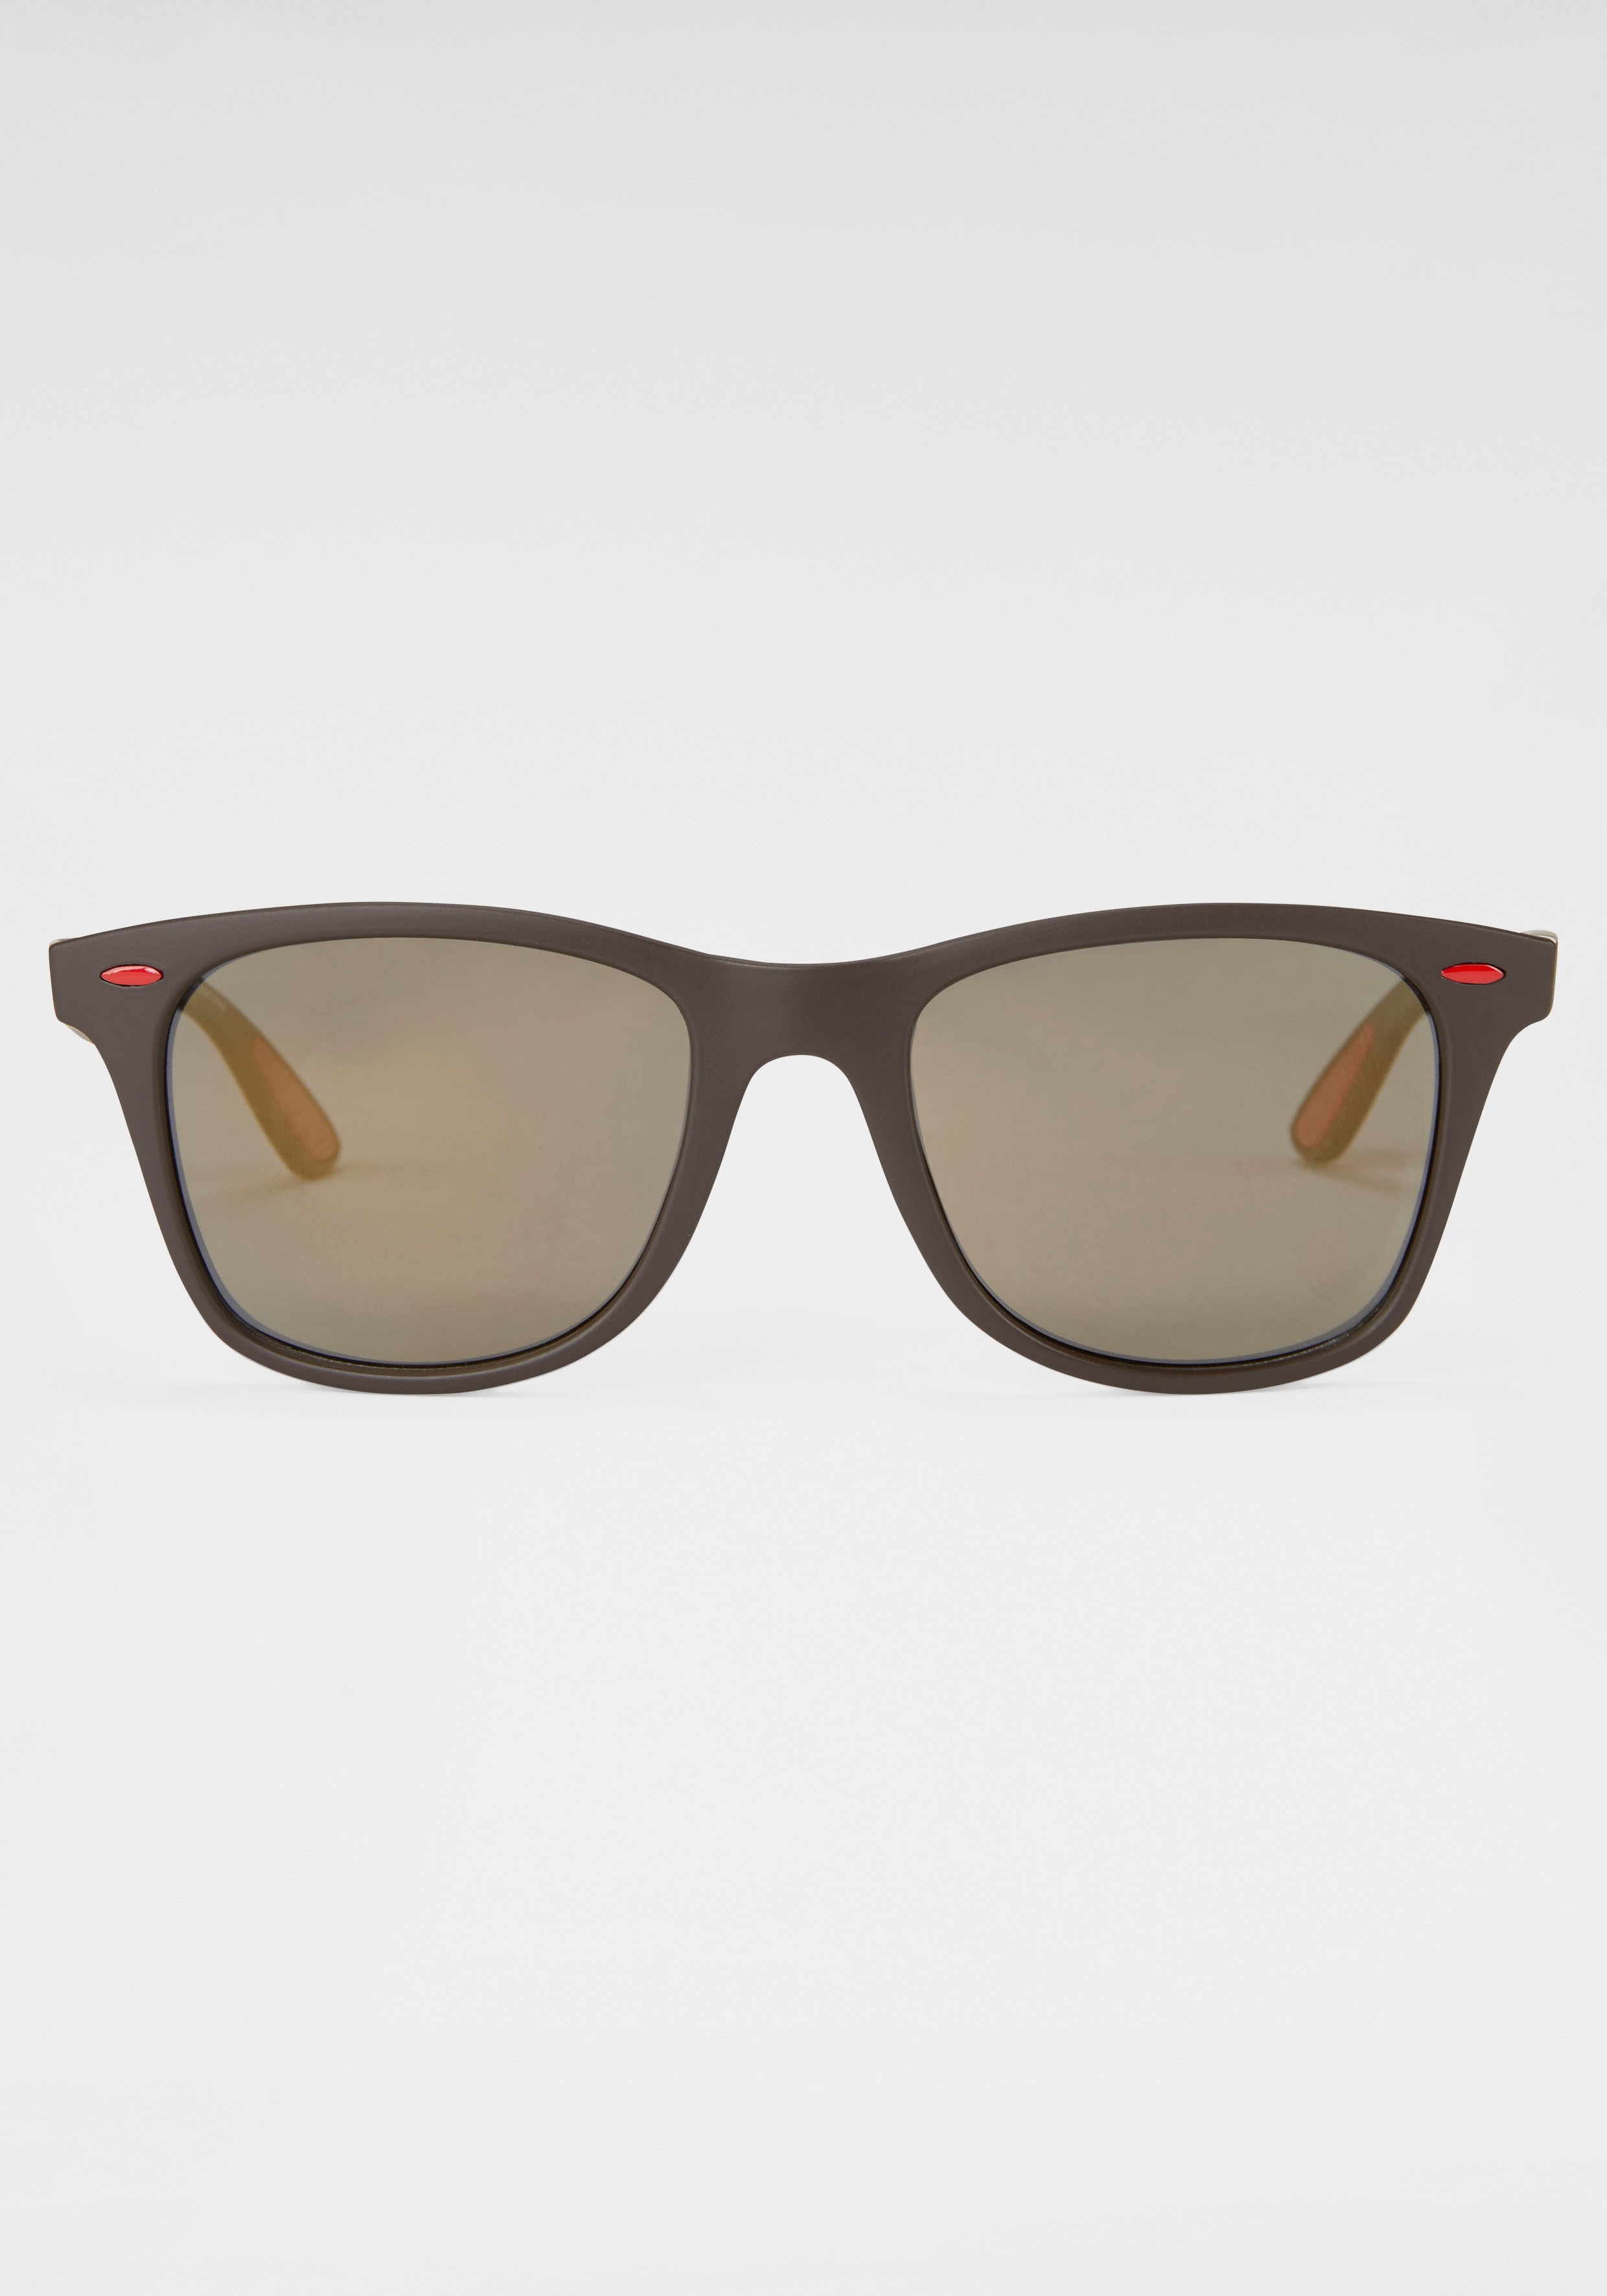 HIS Eyewear Sonnenbrille   Accessoires > Sonnenbrillen > Sonstige Sonnenbrillen   Braun   His Eyewear